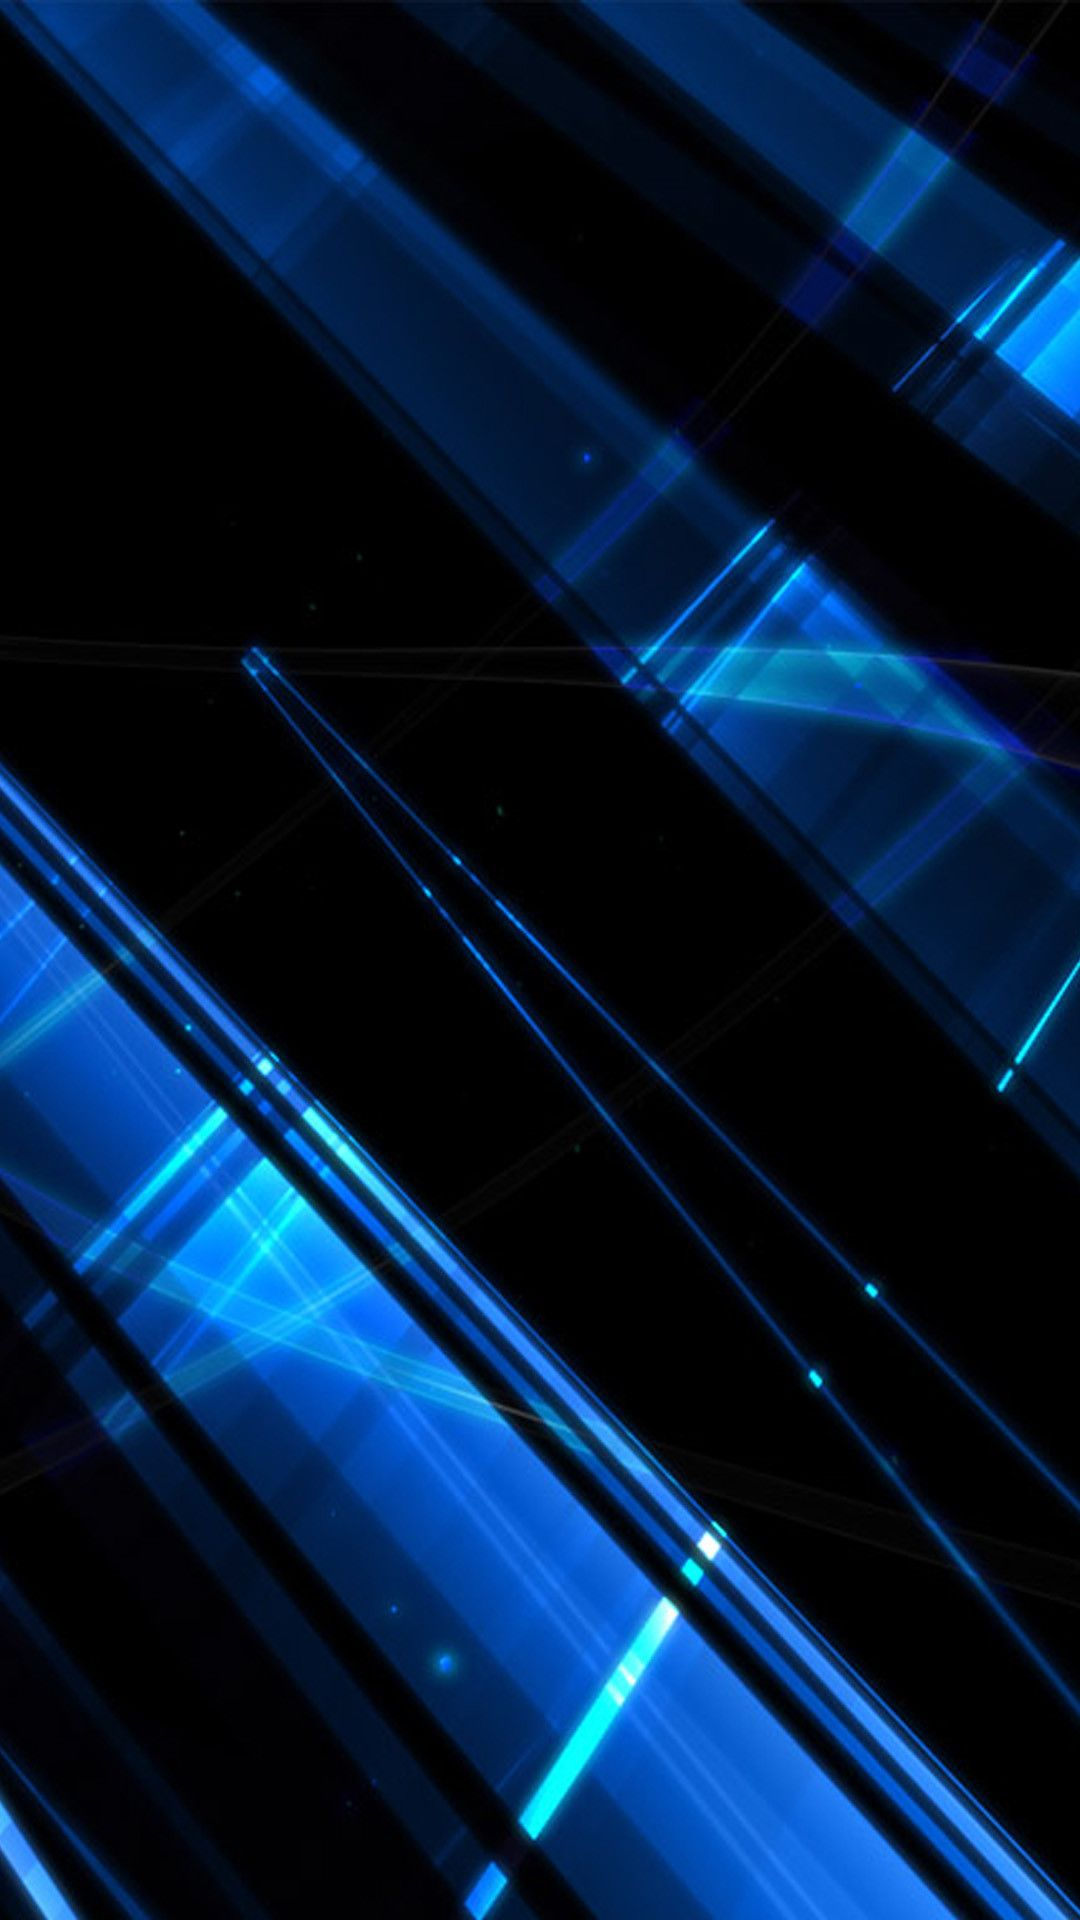 1080x1920 stock Wallpapers Gallery Monodomo Nexus 6 1080x1920